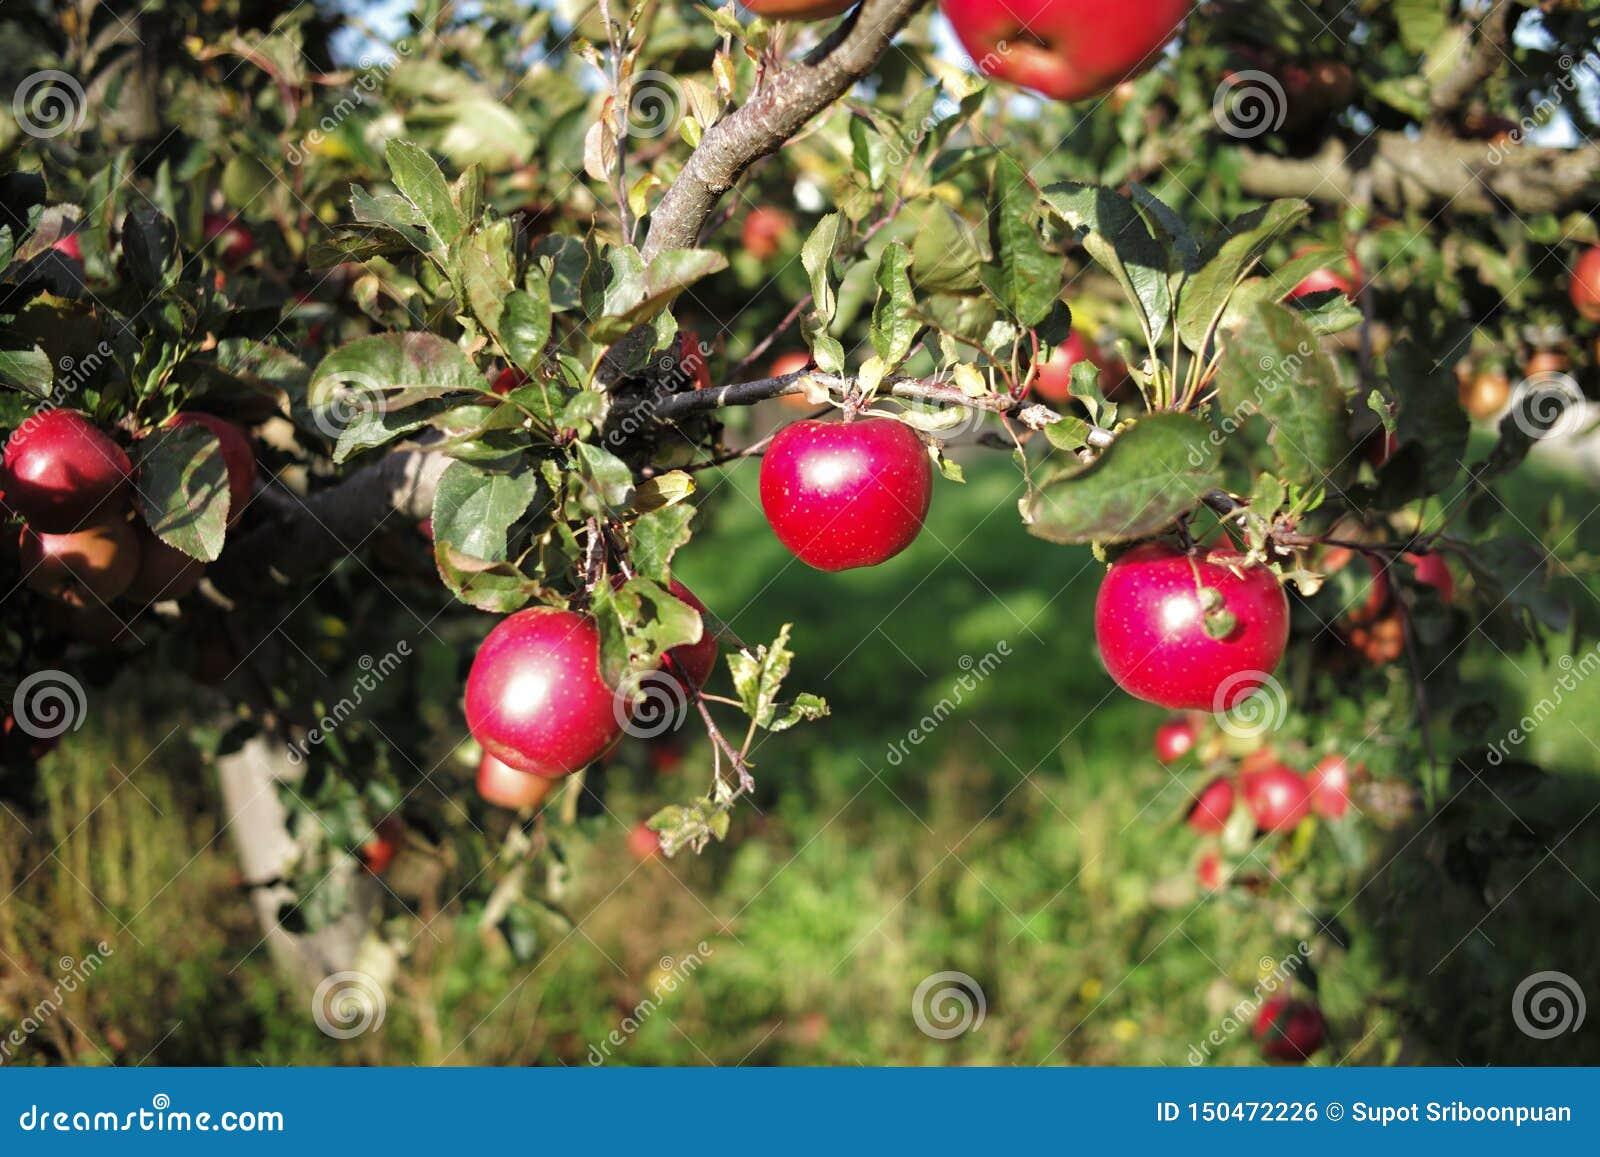 Pomme dans la ferme